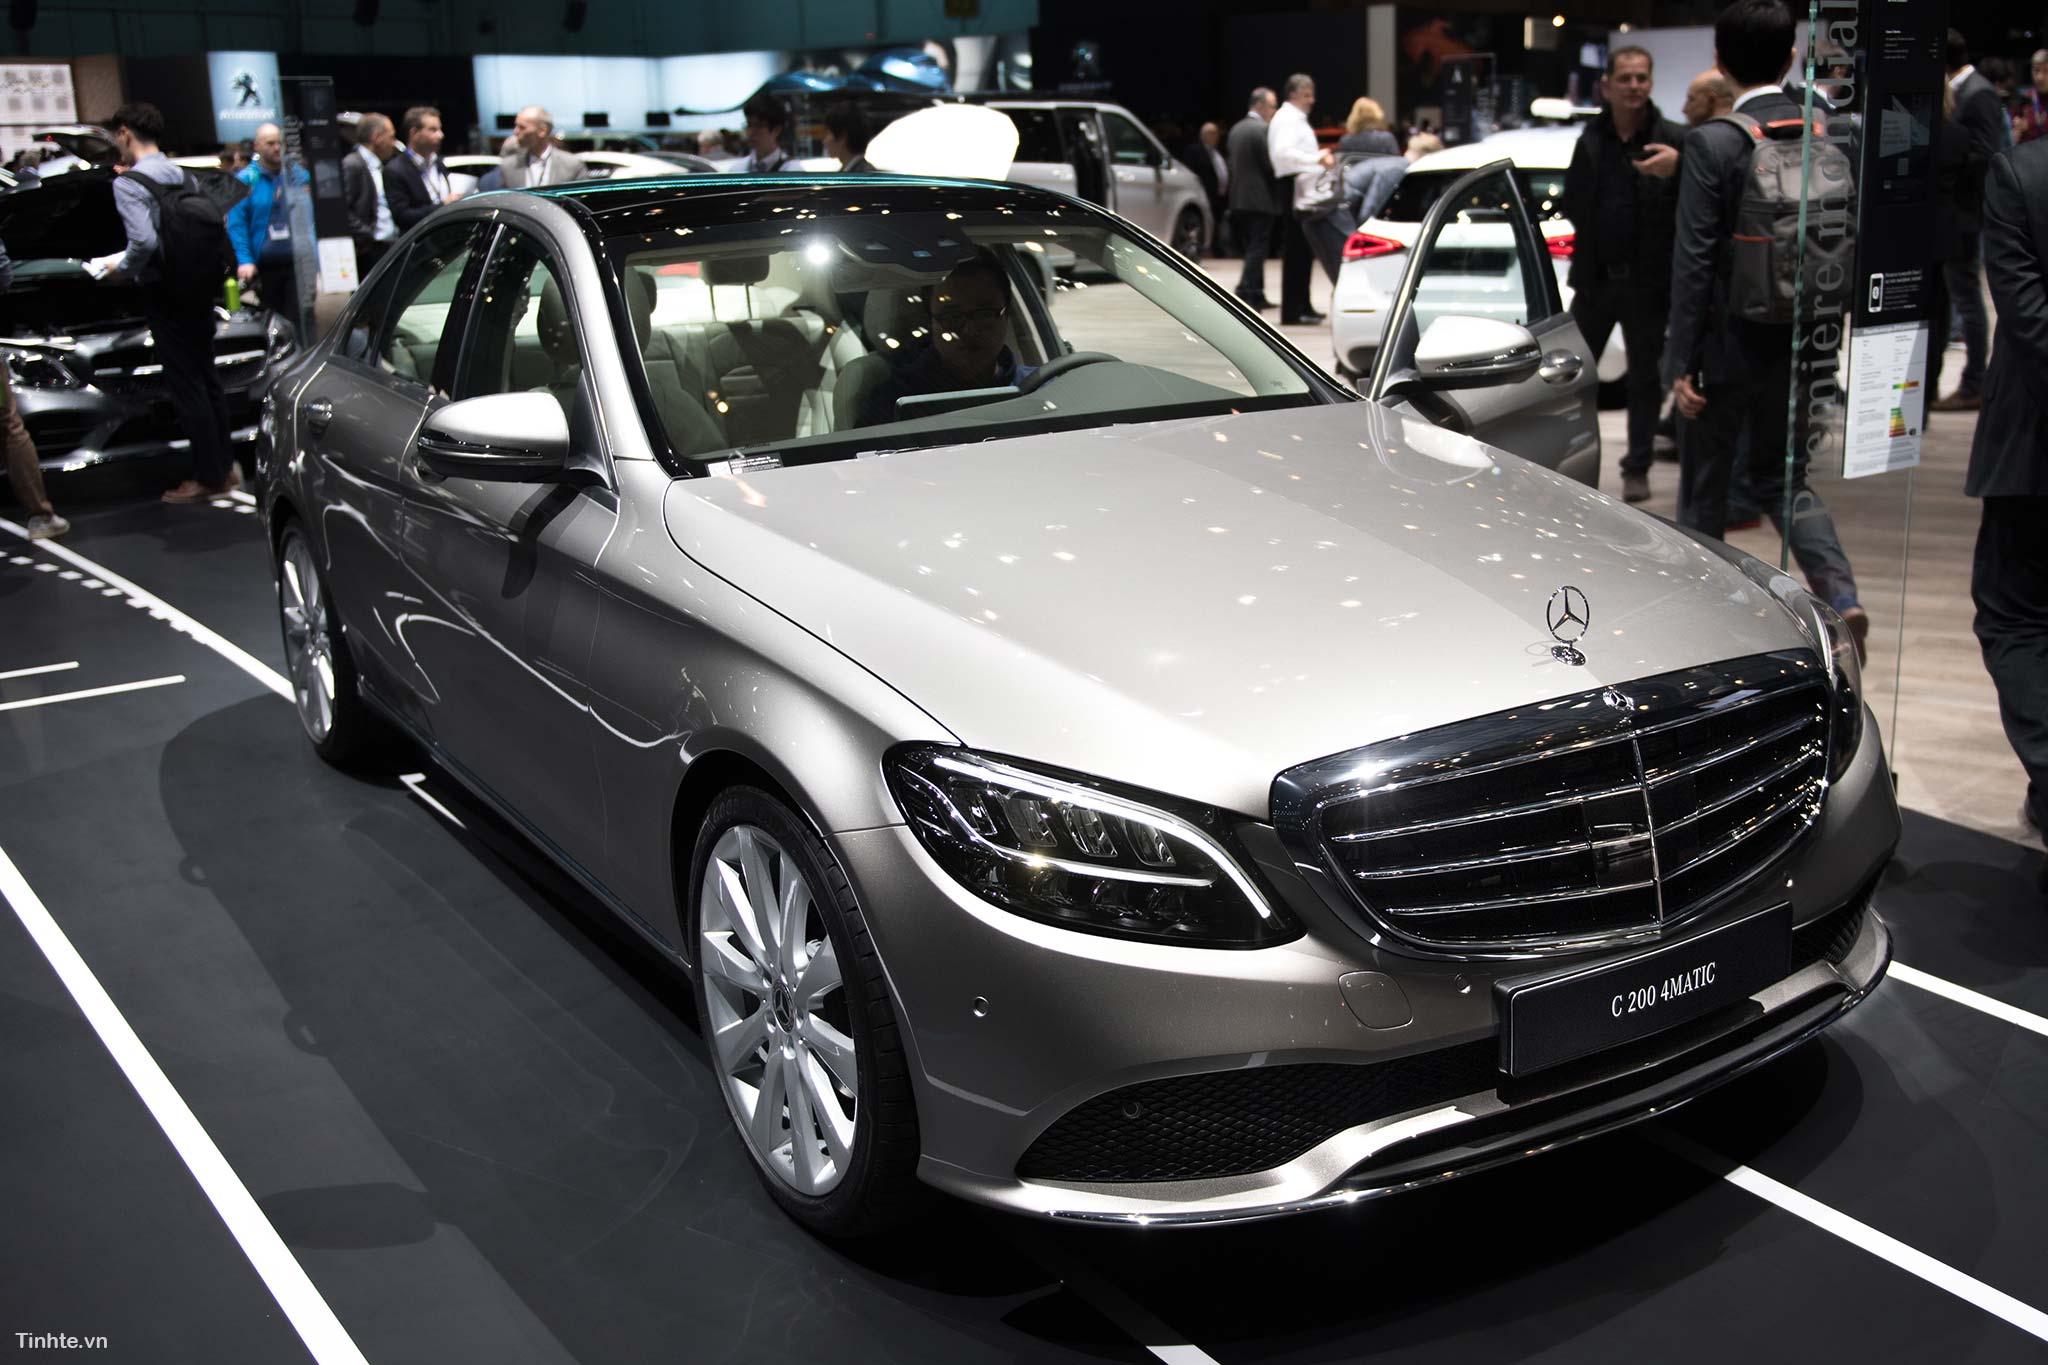 tinhte_Mercedes-Benz-C-200-4MATIC-6.jpg